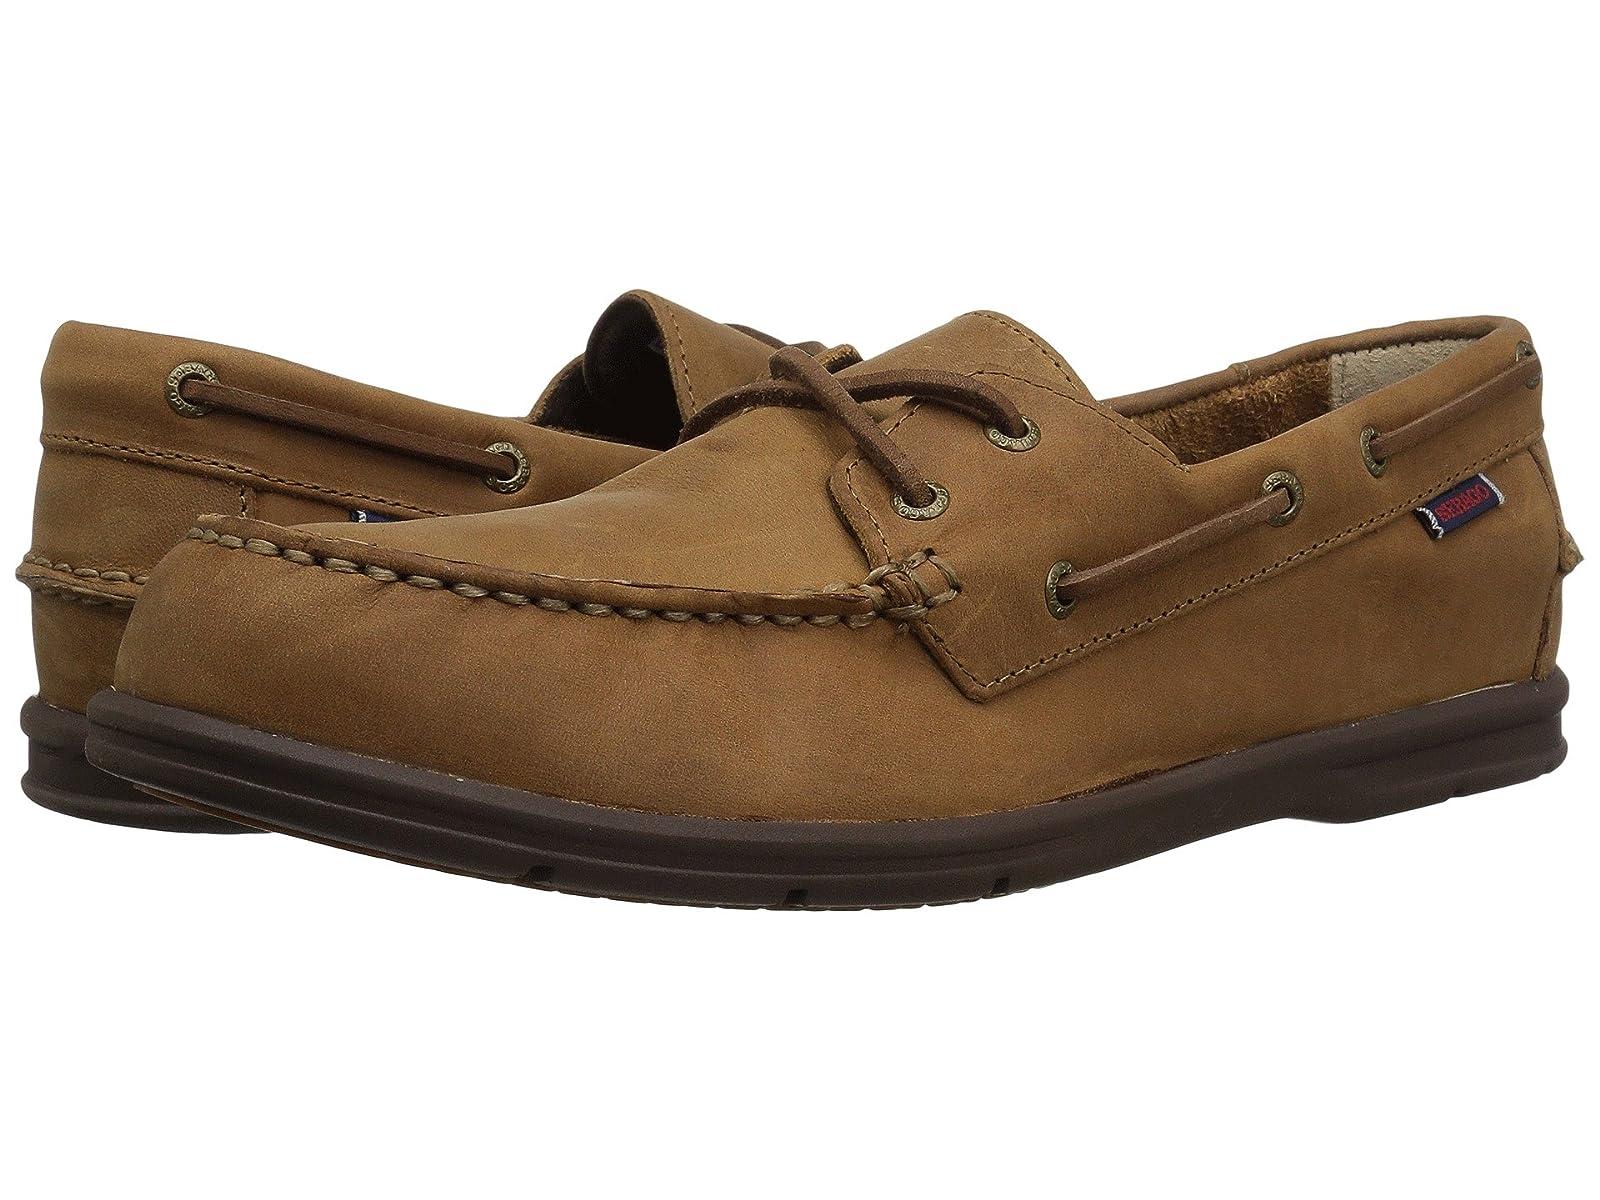 Sebago Litesides Two EyeCheap and distinctive eye-catching shoes